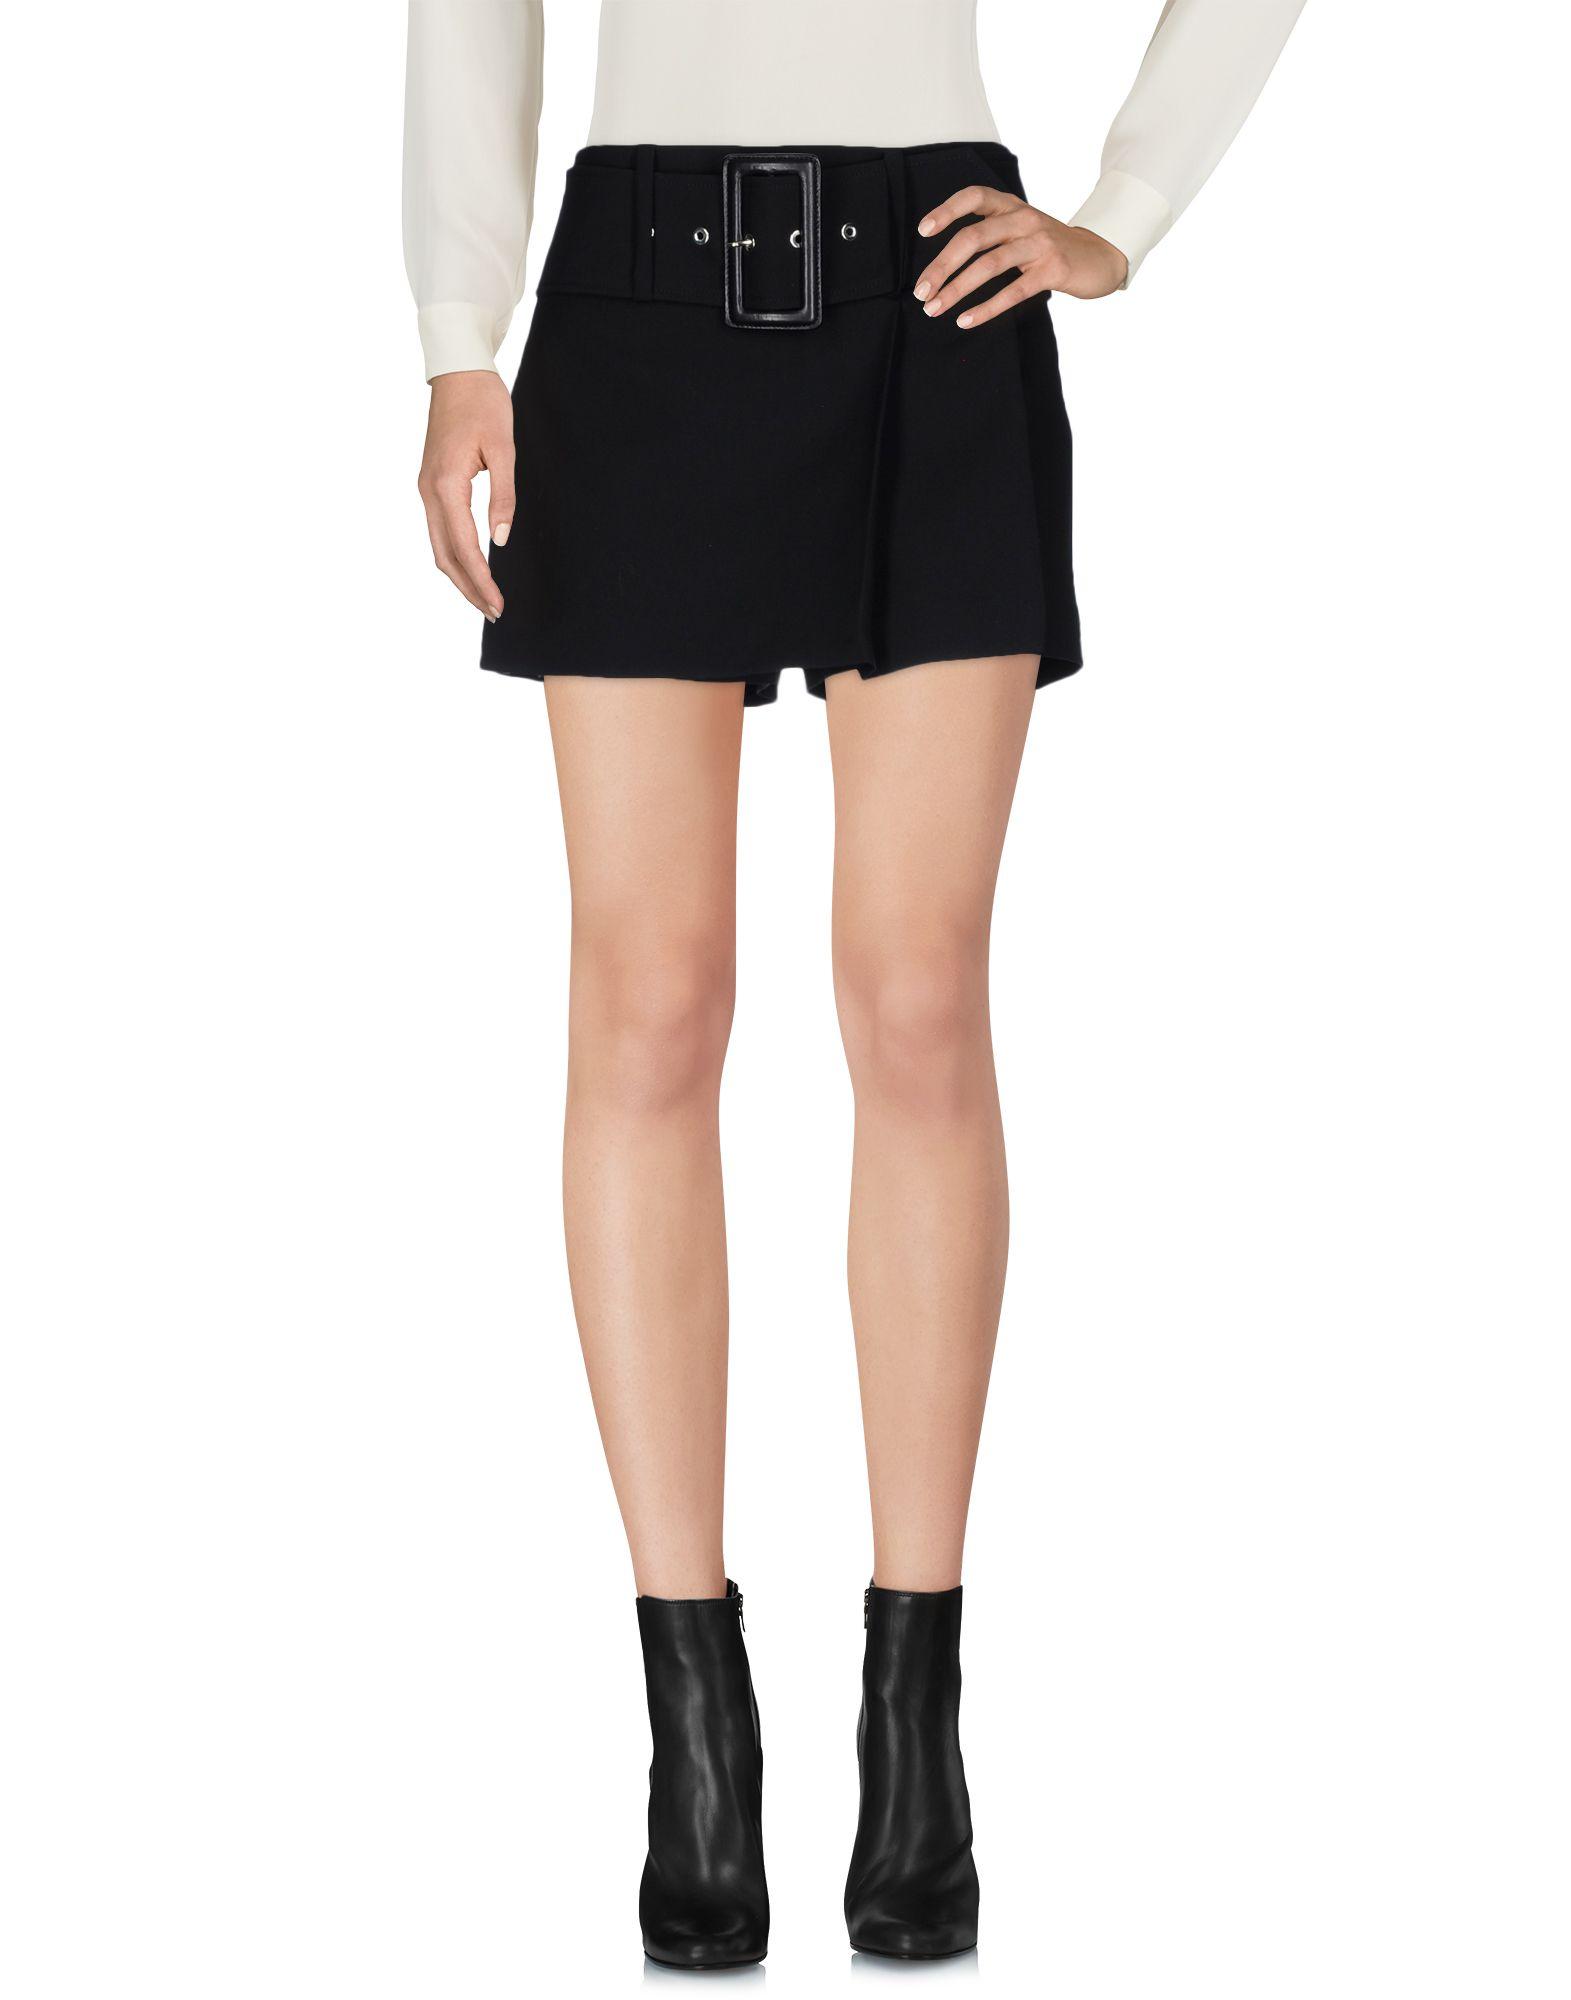 'Givenchy Mini Skirts